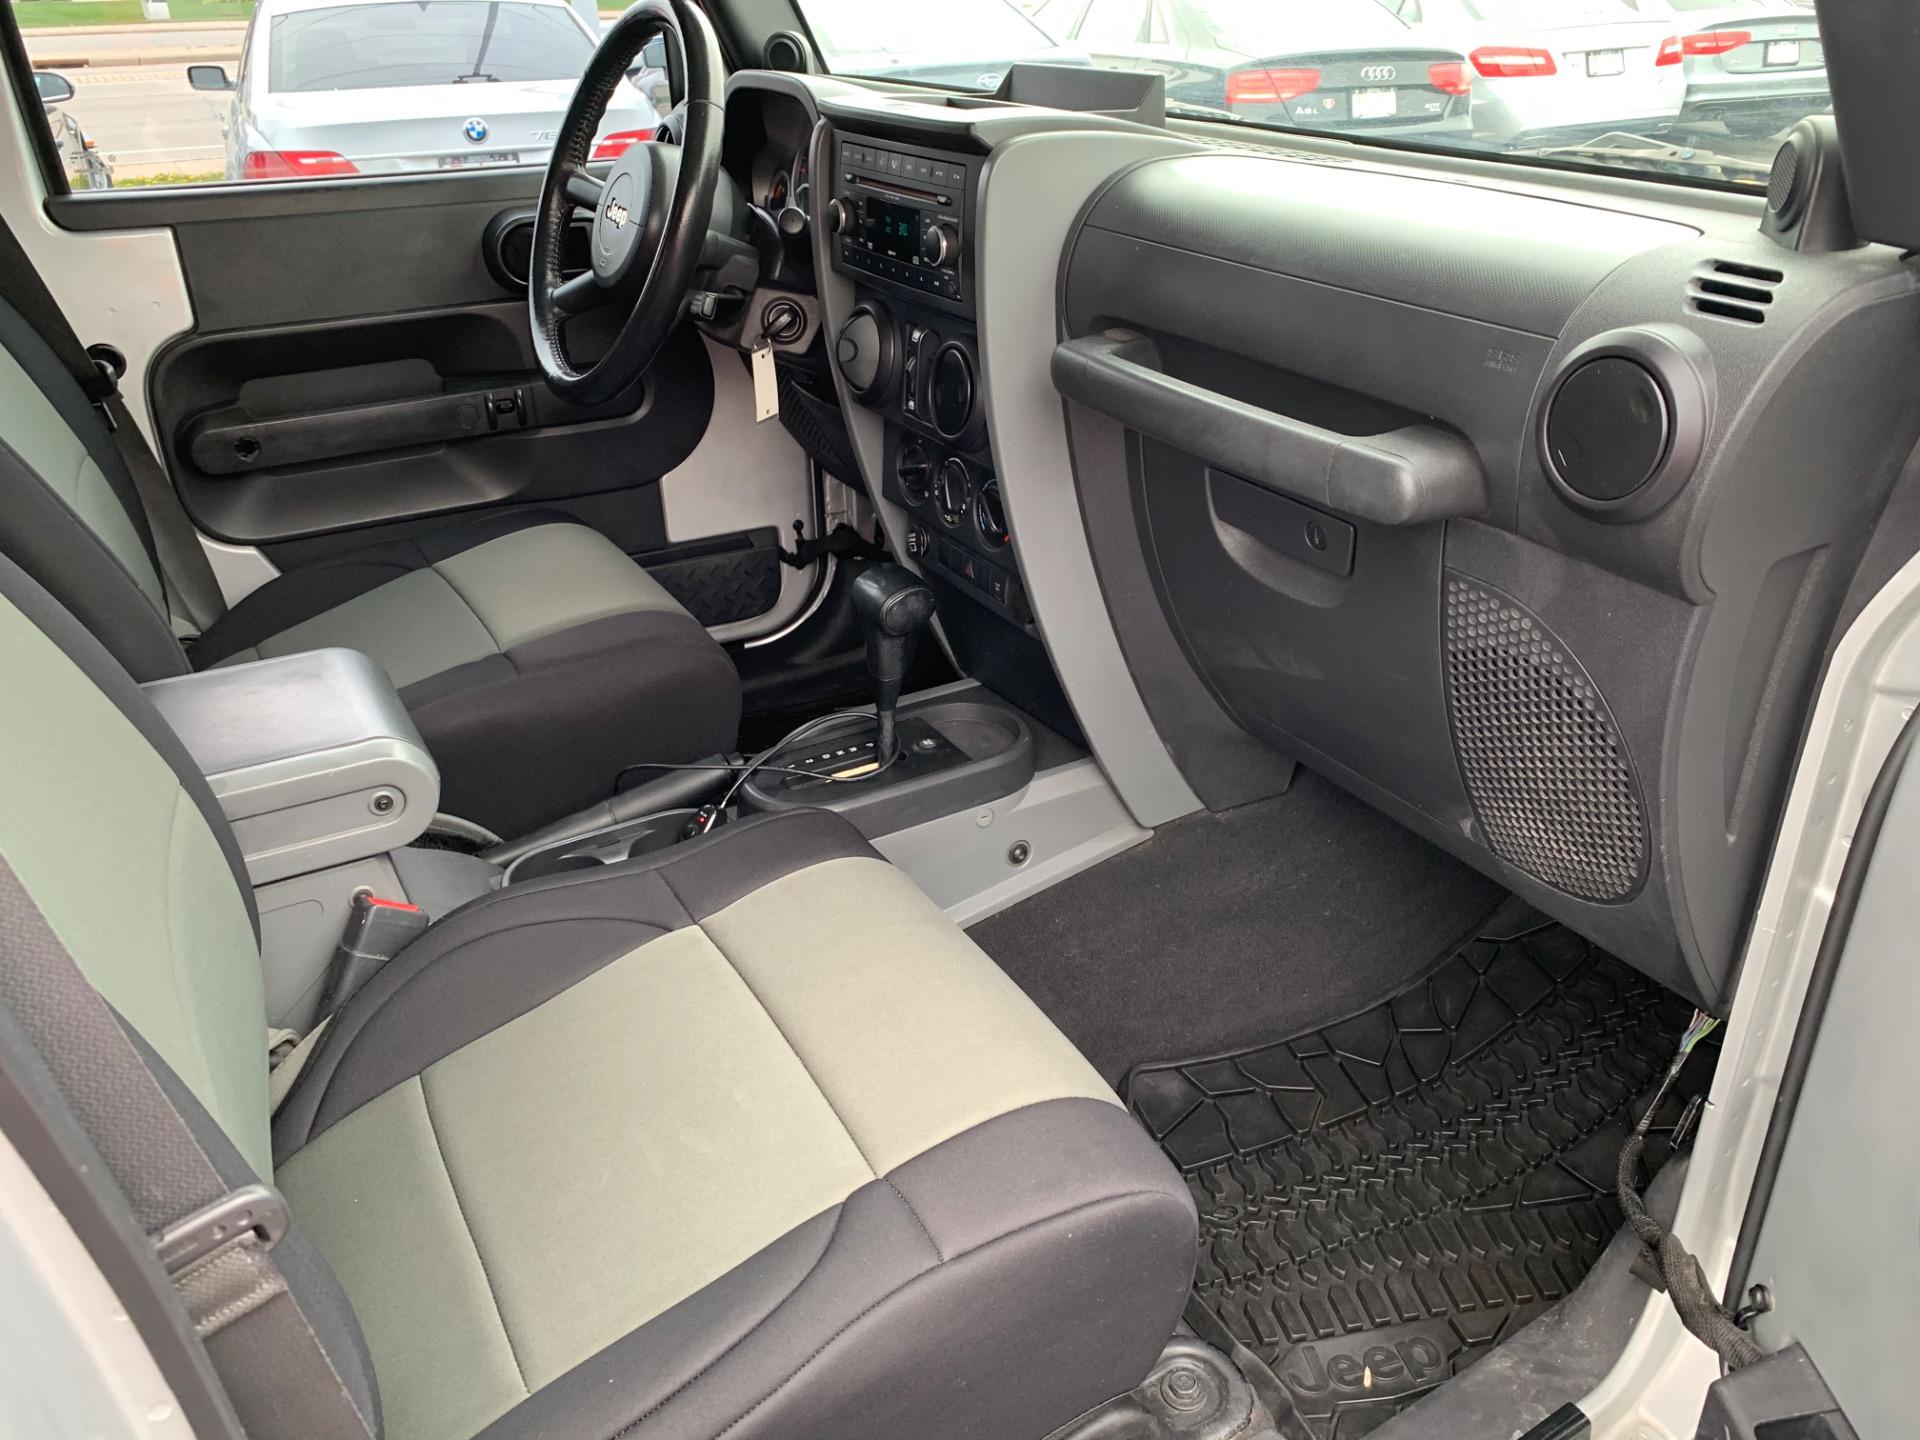 Used-2007-Jeep-Wrangler-Unlimited-Sahara-4x4-Rubicon-Express-Lift